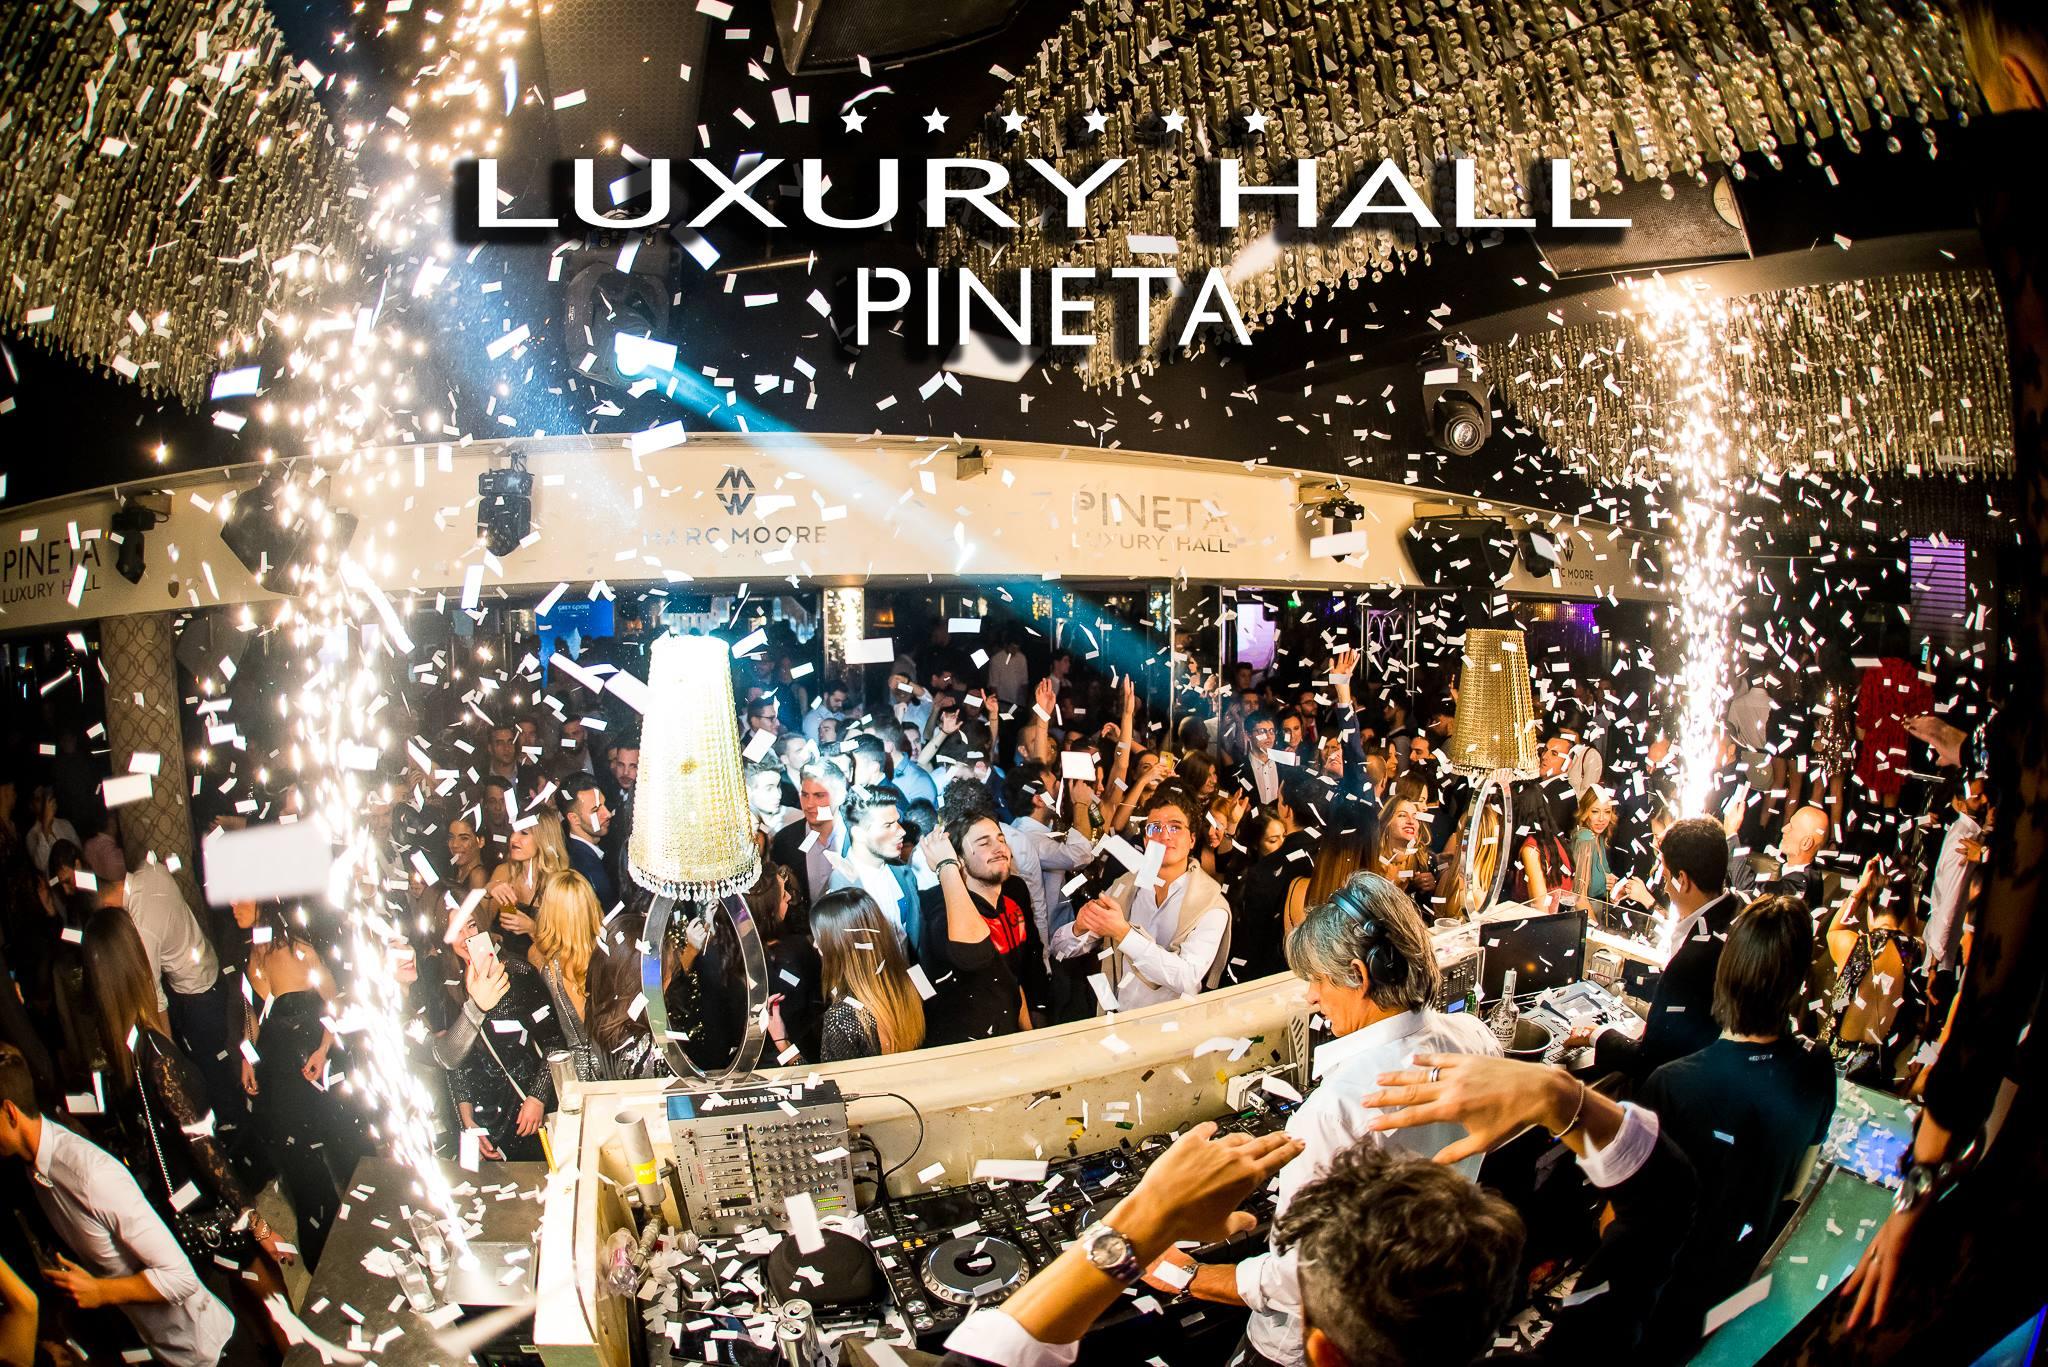 Discoteca Pineta Milano Marittima, il club Vip d'Italia